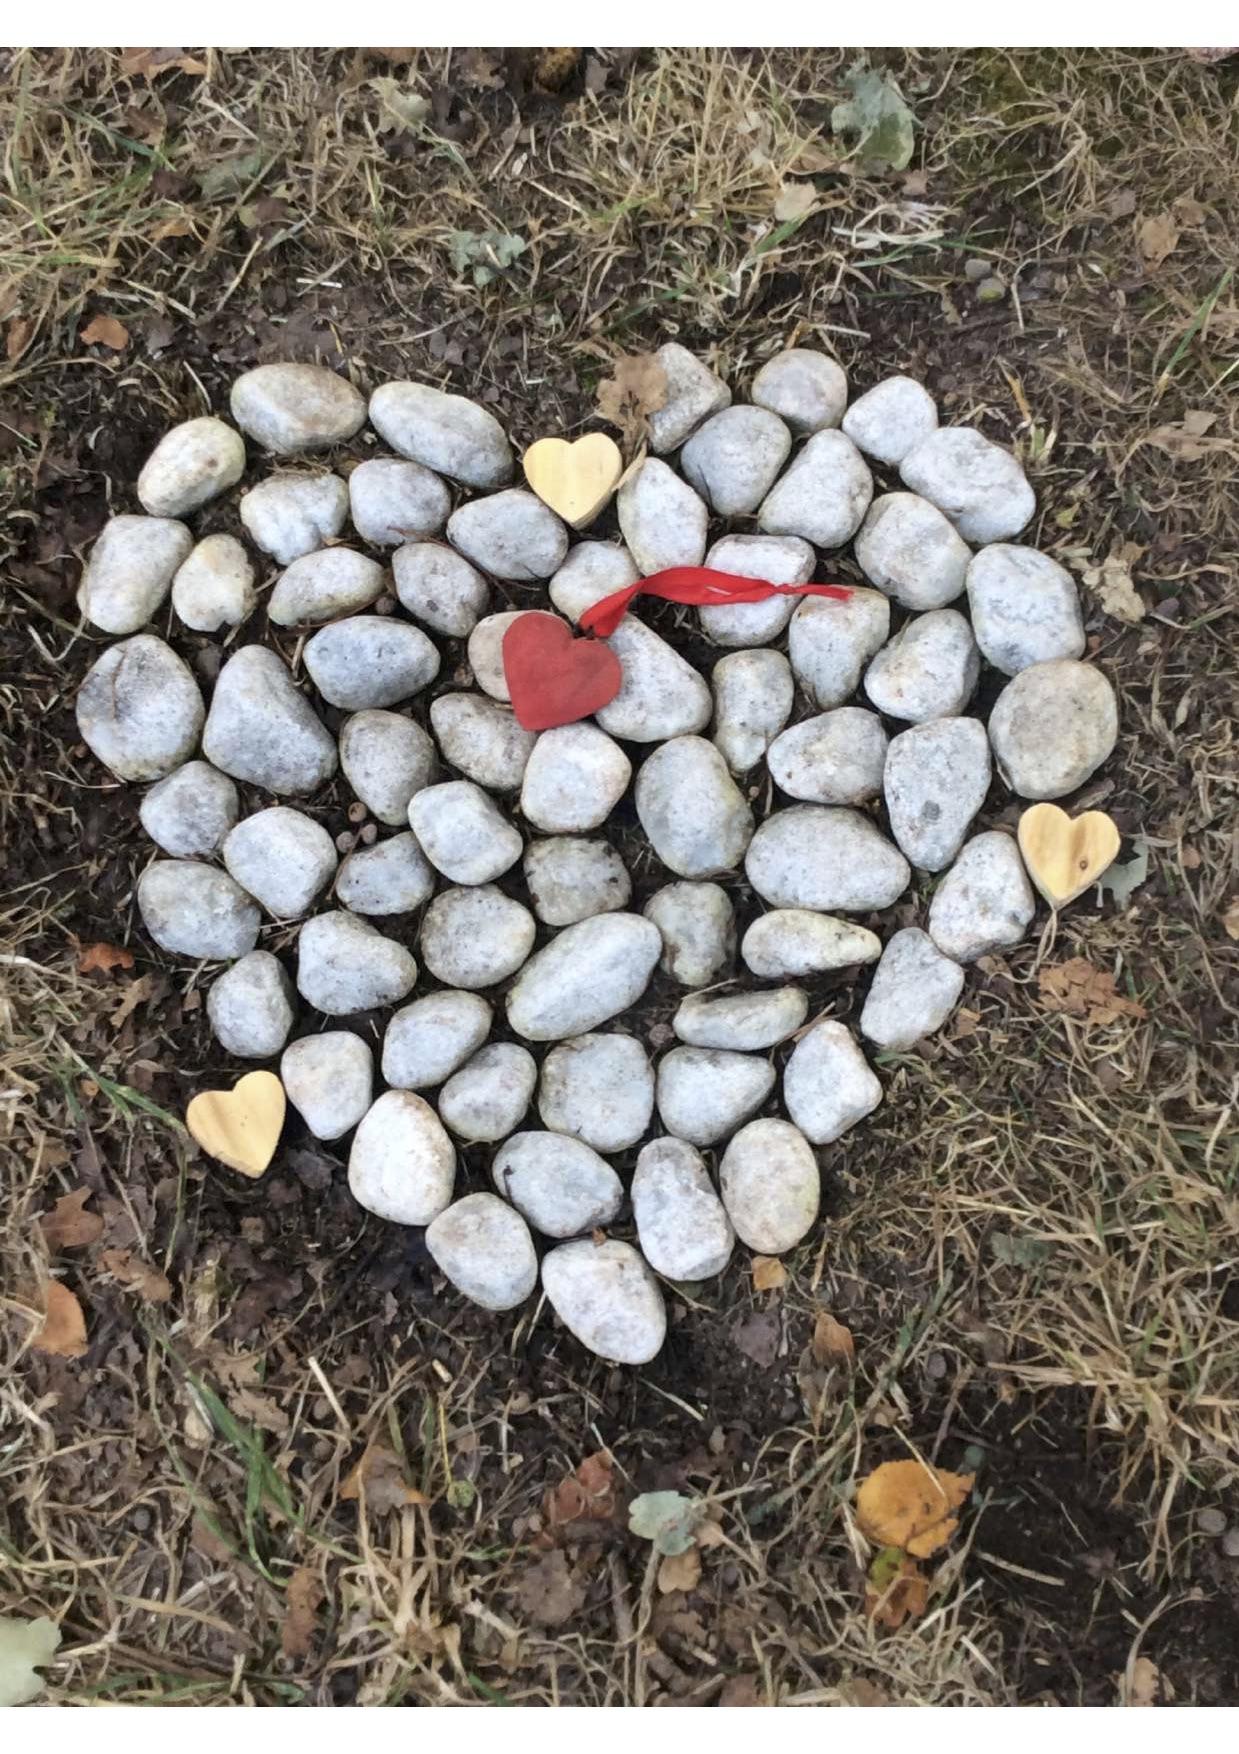 maliguene-broceliande-bretagne-eco-lieu-accueil-evenementiel-cœur-cercle-ressourcement